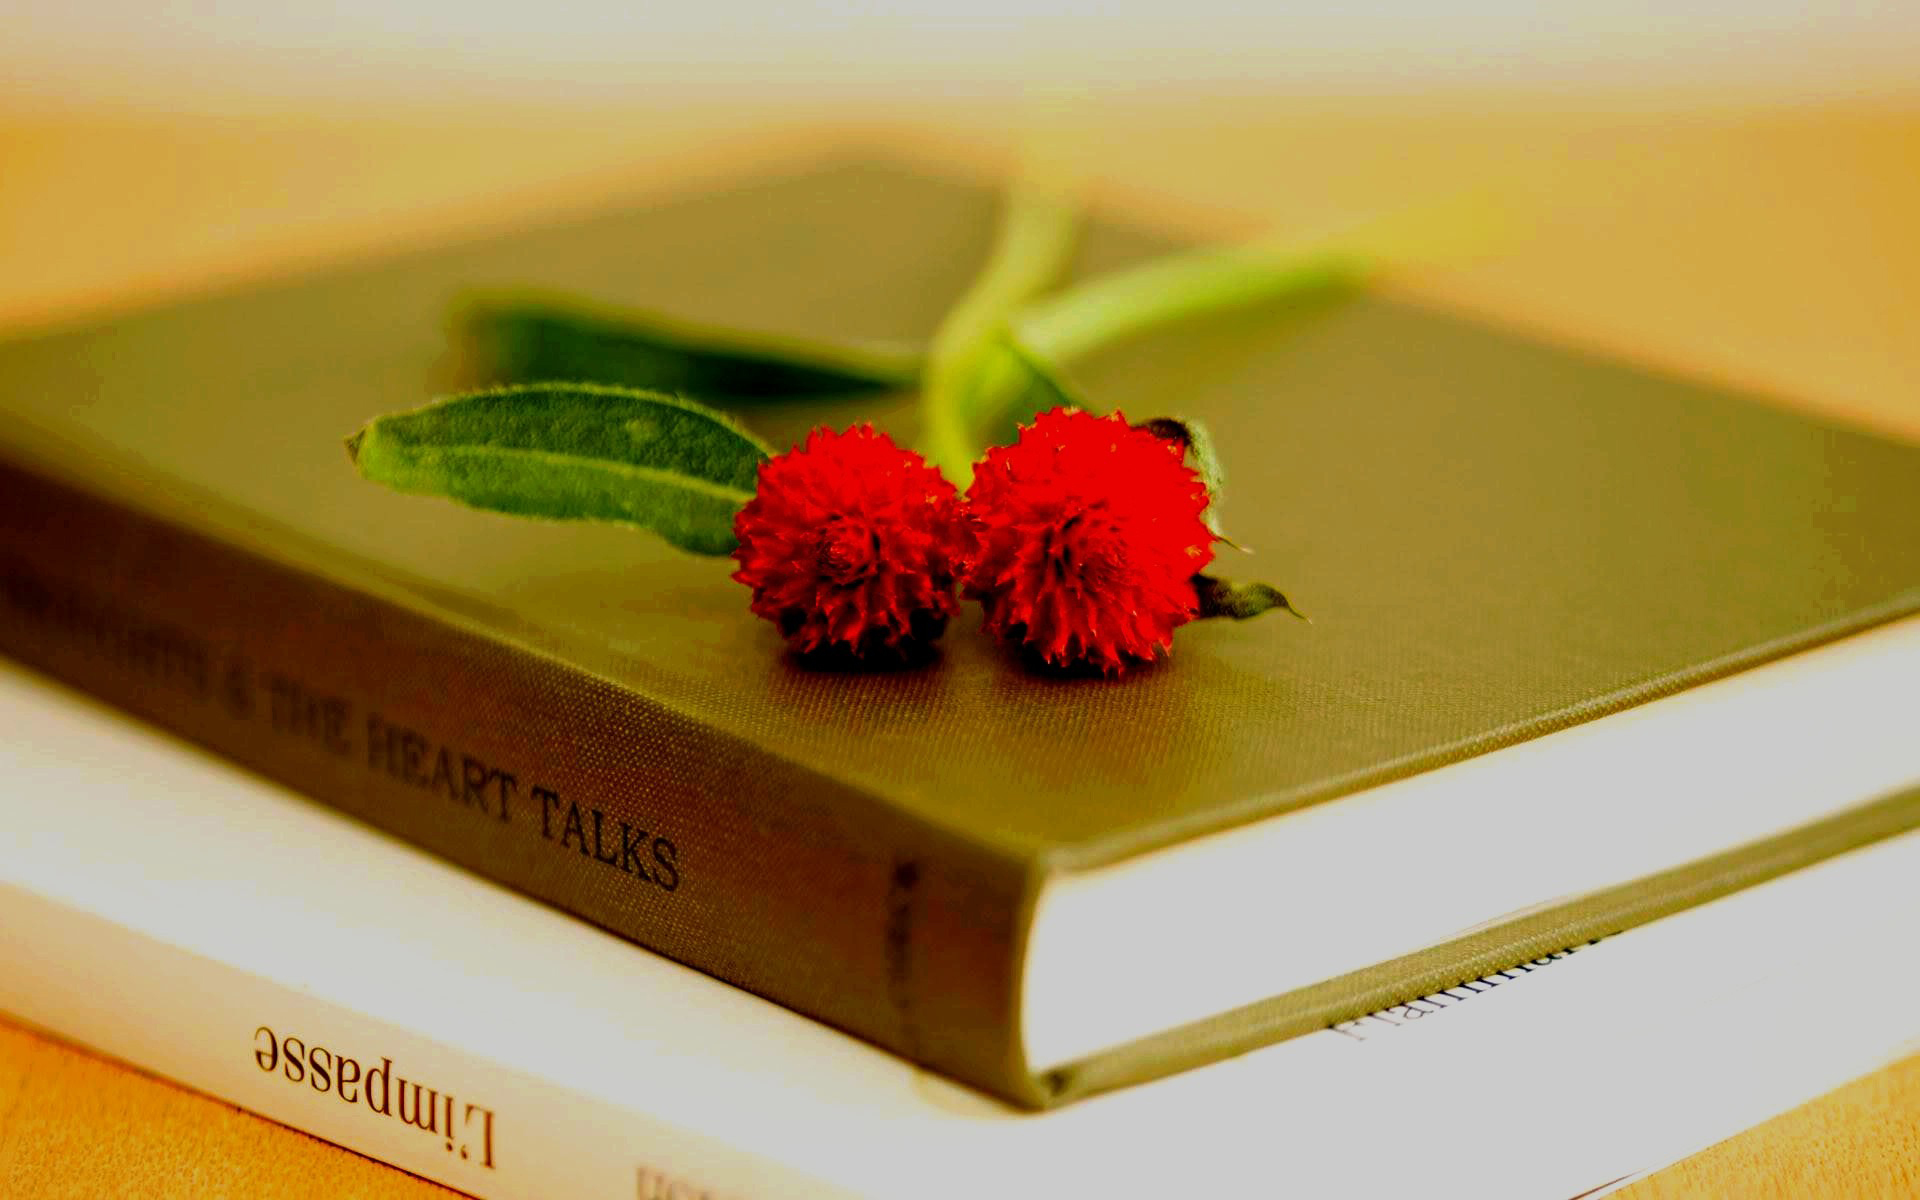 flower on book hd wallpaper | hd wallpapers